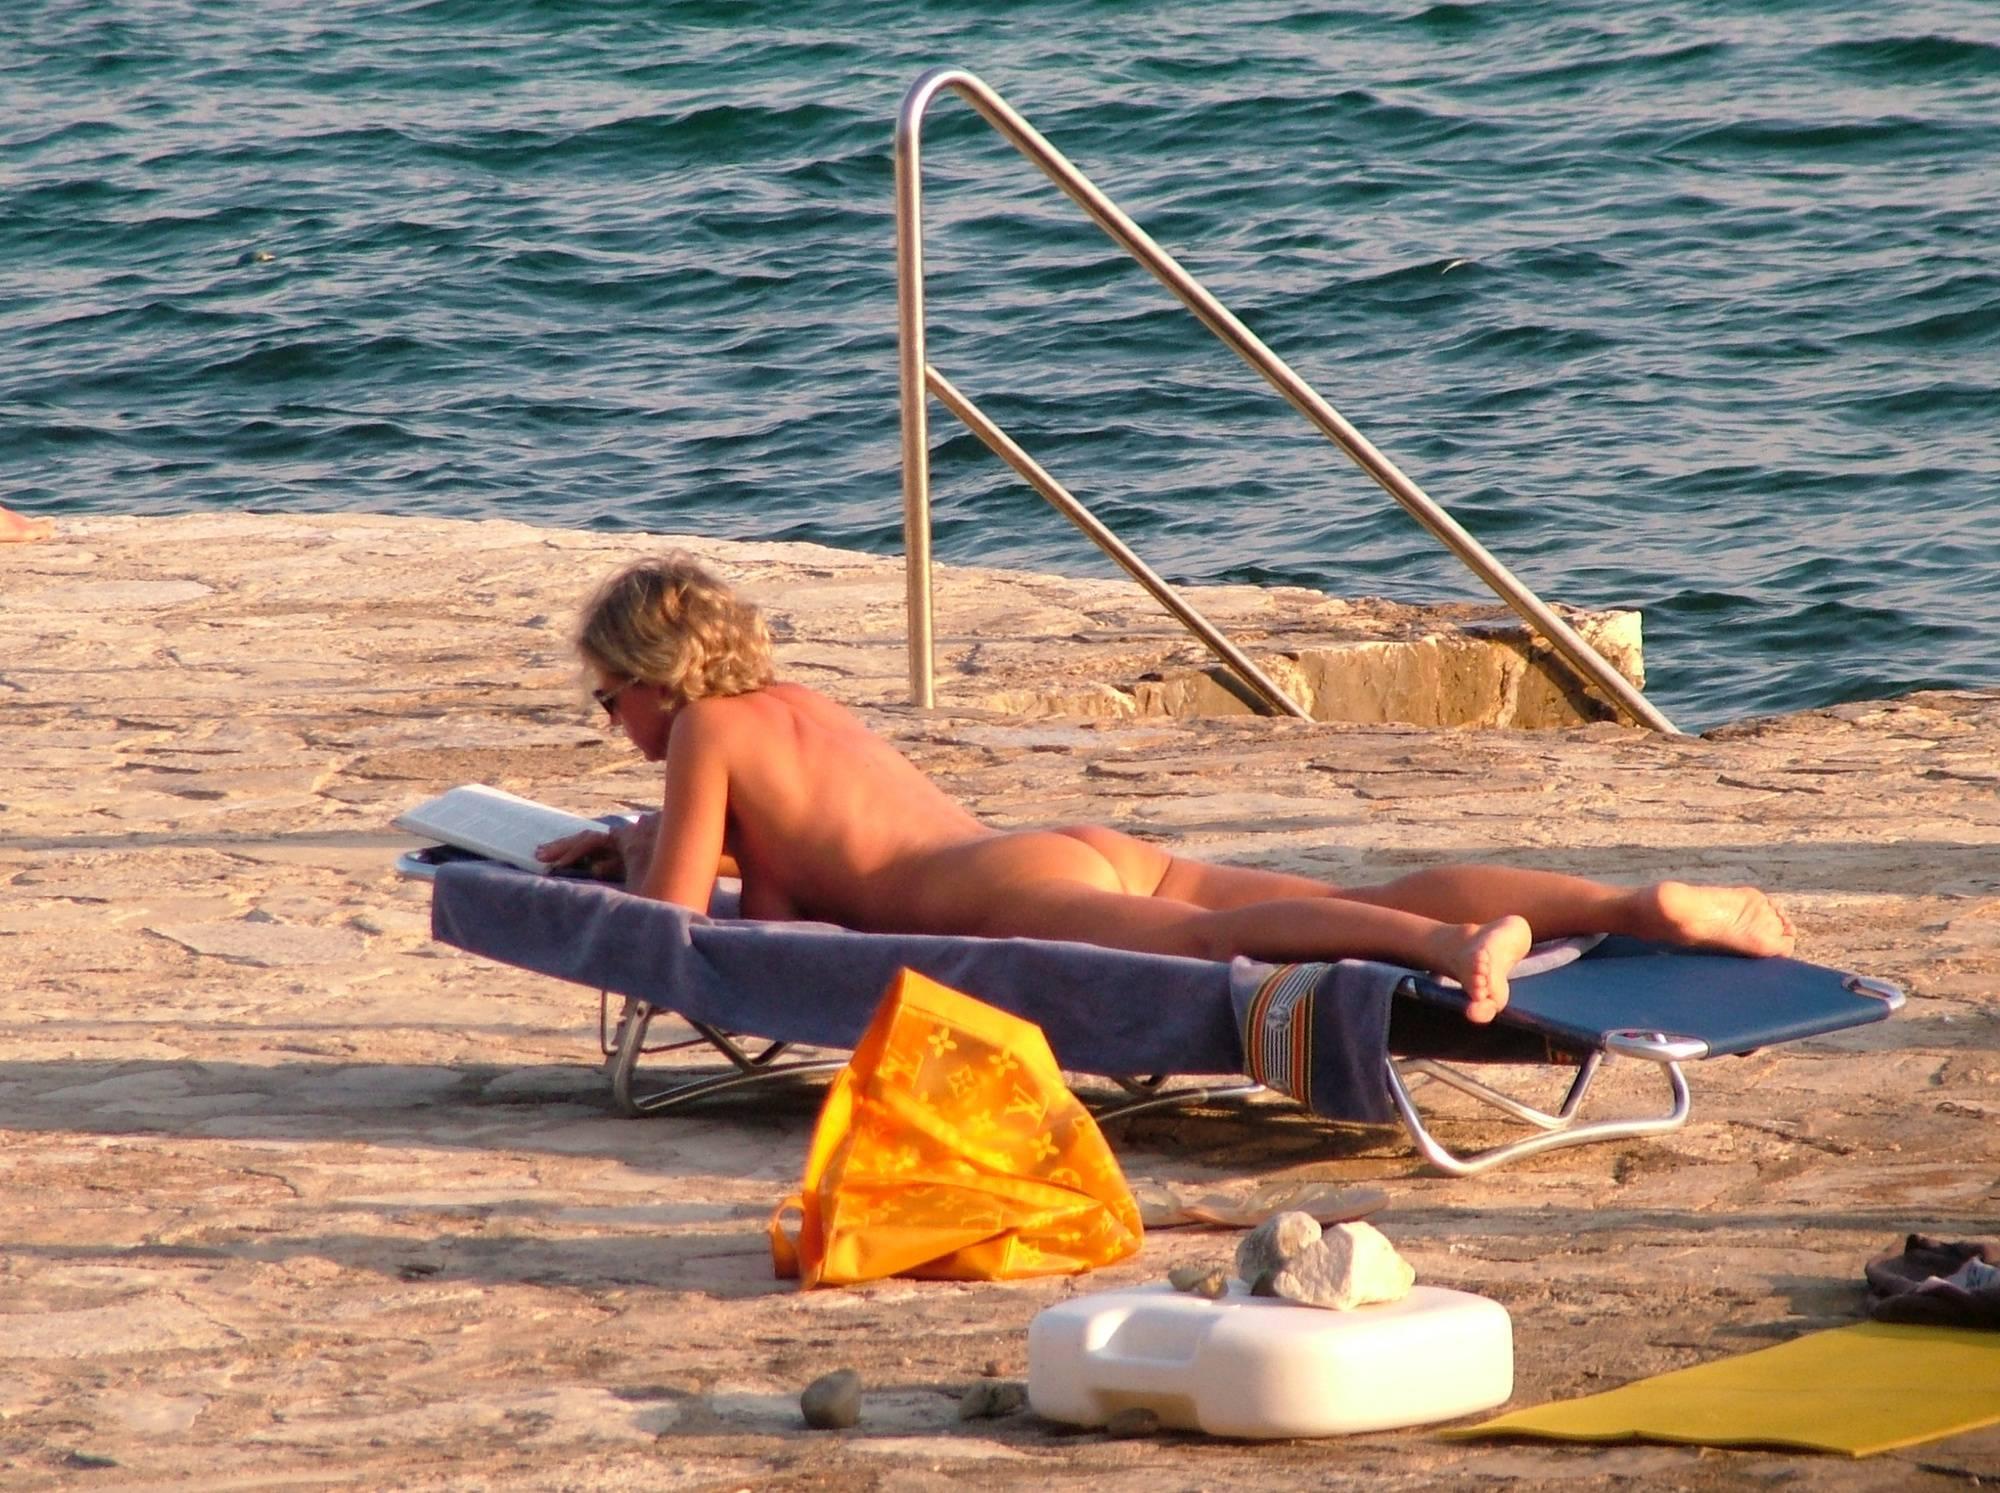 Purenudism Images-FKK Reflection Sun Beach - 4